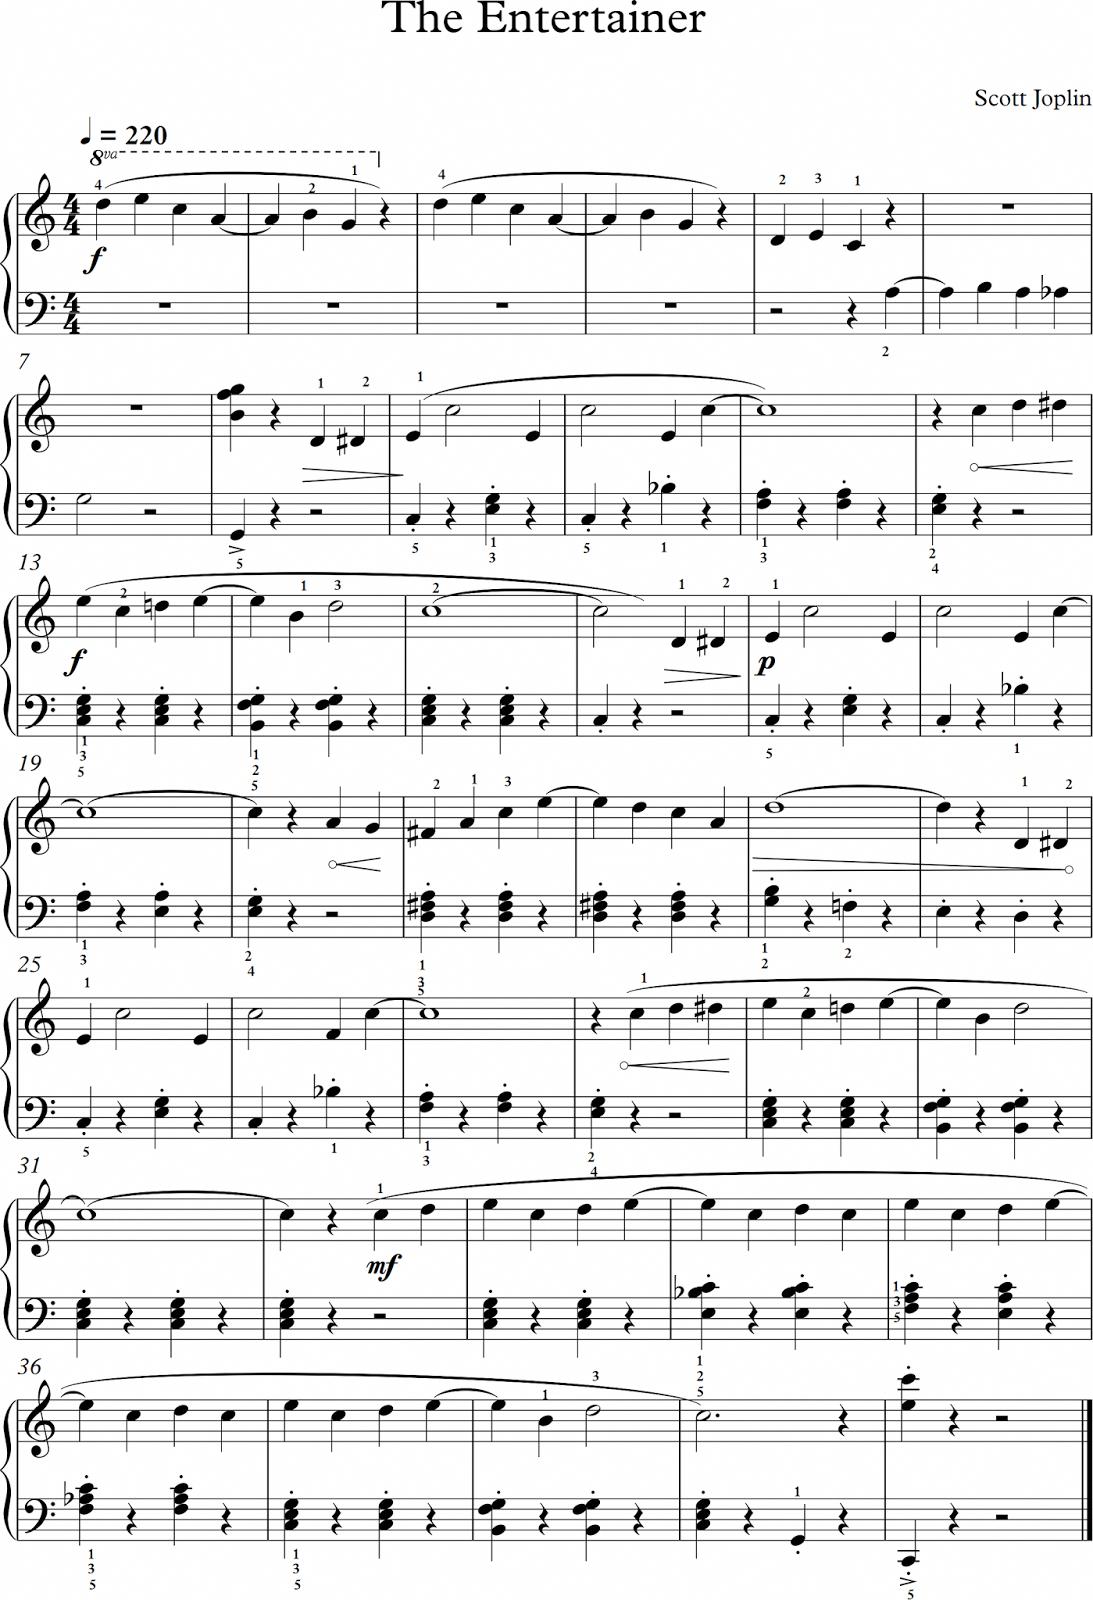 The Entertainer. Scott Joplin. Partitura Para Piano. (Banda Sonora - Free Printable Sheet Music For The Entertainer